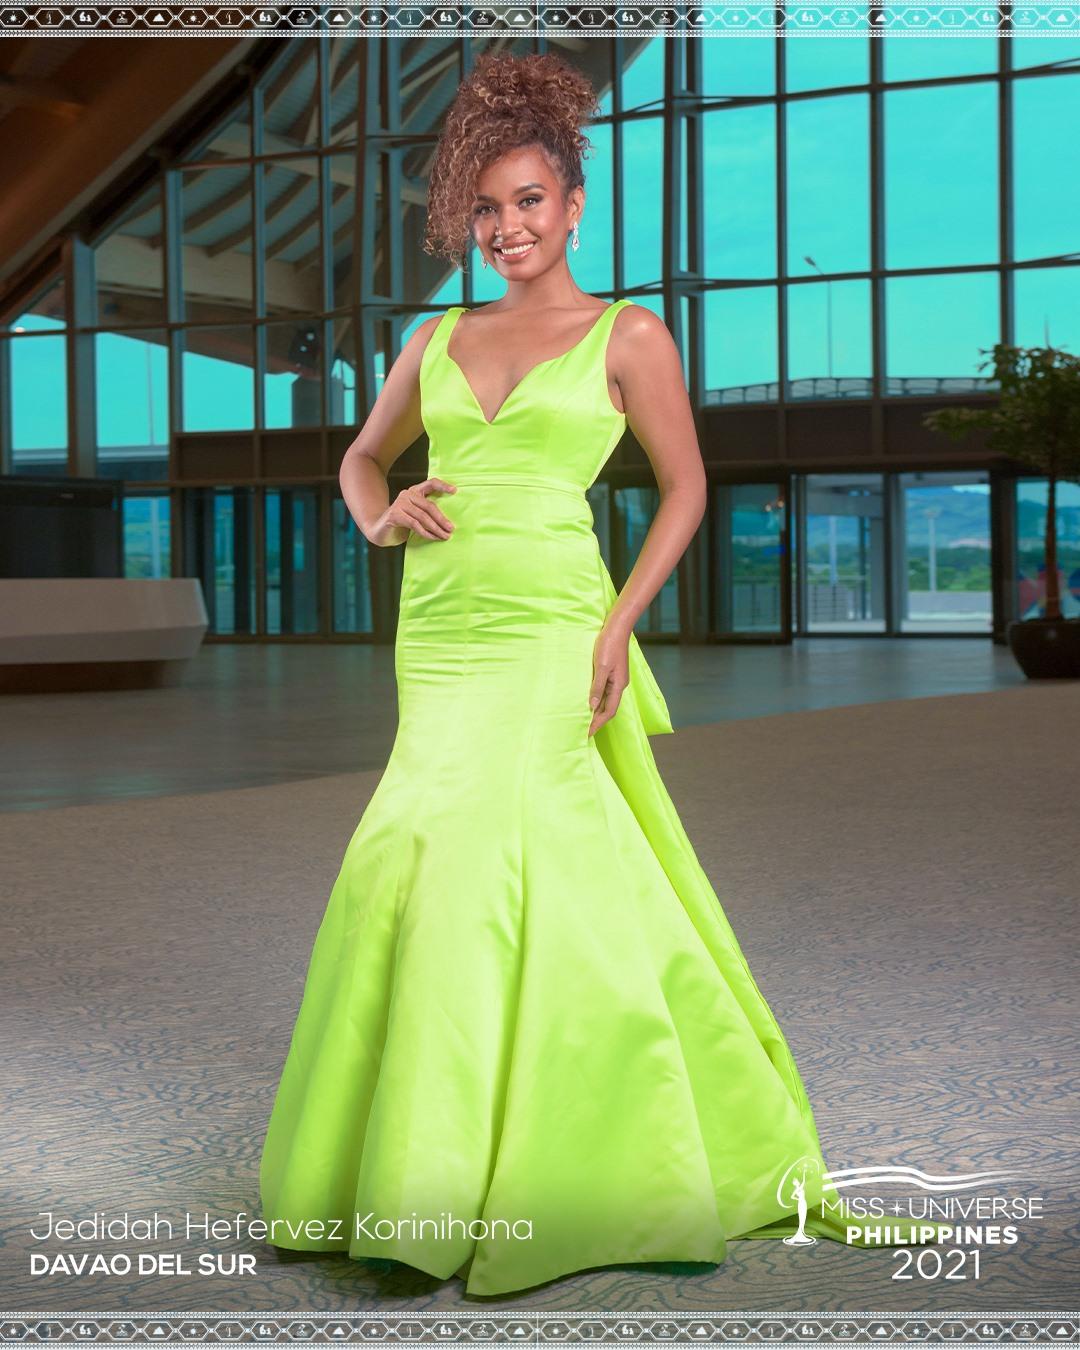 miss-universe-2021-jedidah-hefervez-korinihona-gown